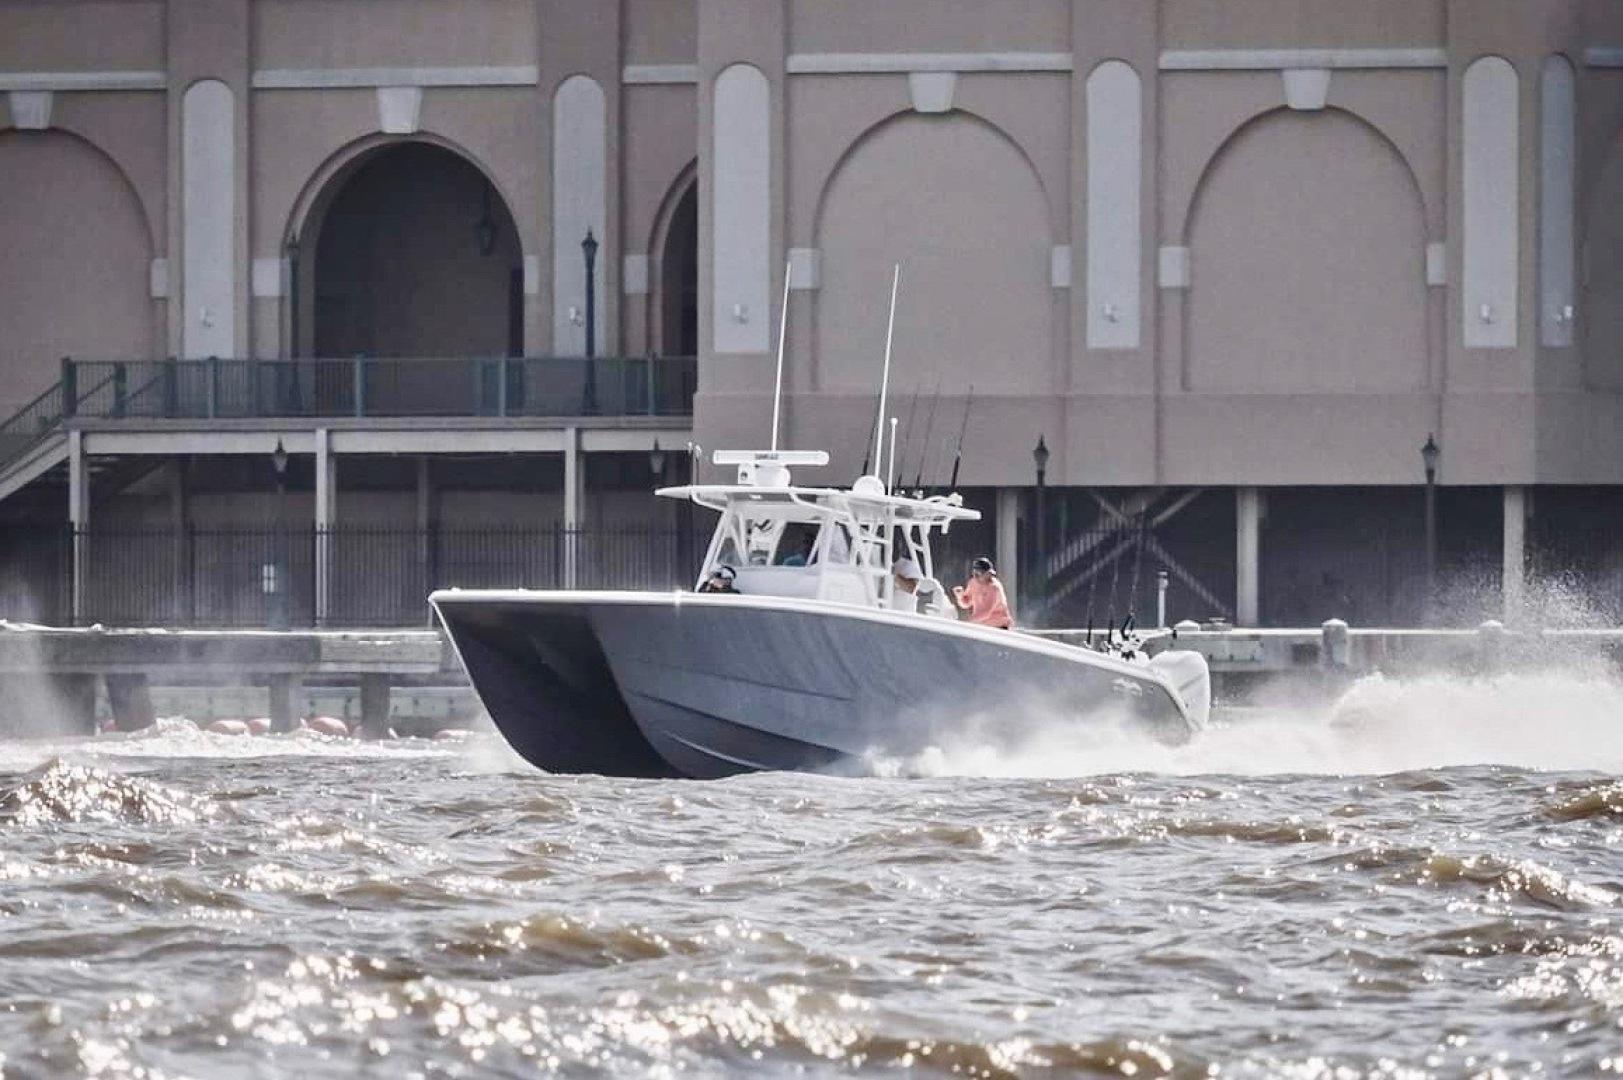 Invincible-Catamaran 2018-Pit Boss Freeport-Texas-United States-1380086 | Thumbnail